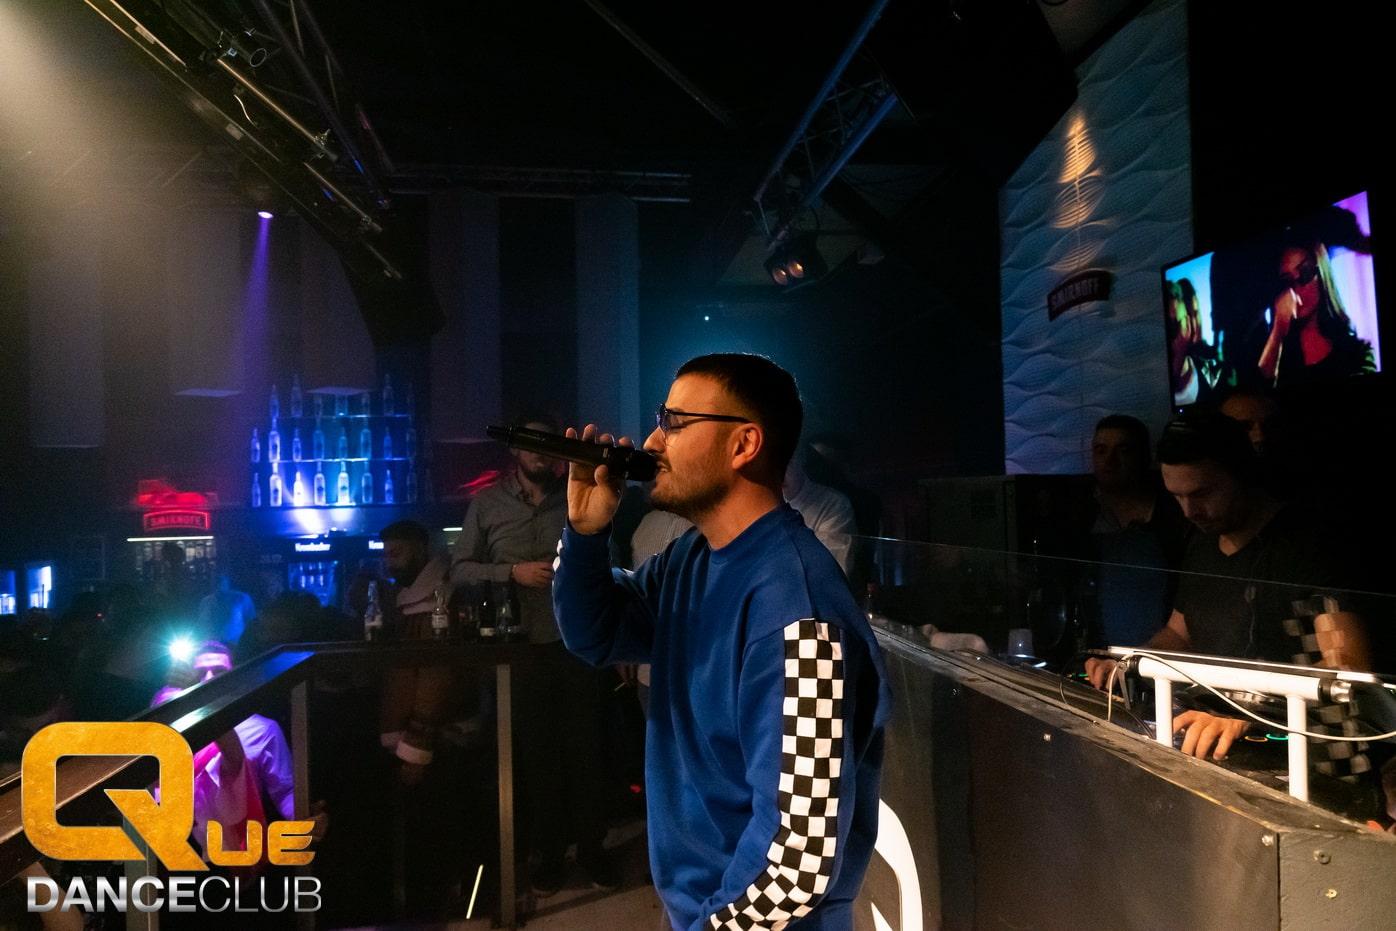 2018_12_08_Que_Danceclub_Paparazzo_Night_Ardian_Bujupi_Live_Nightlife_Scene_Timo_054